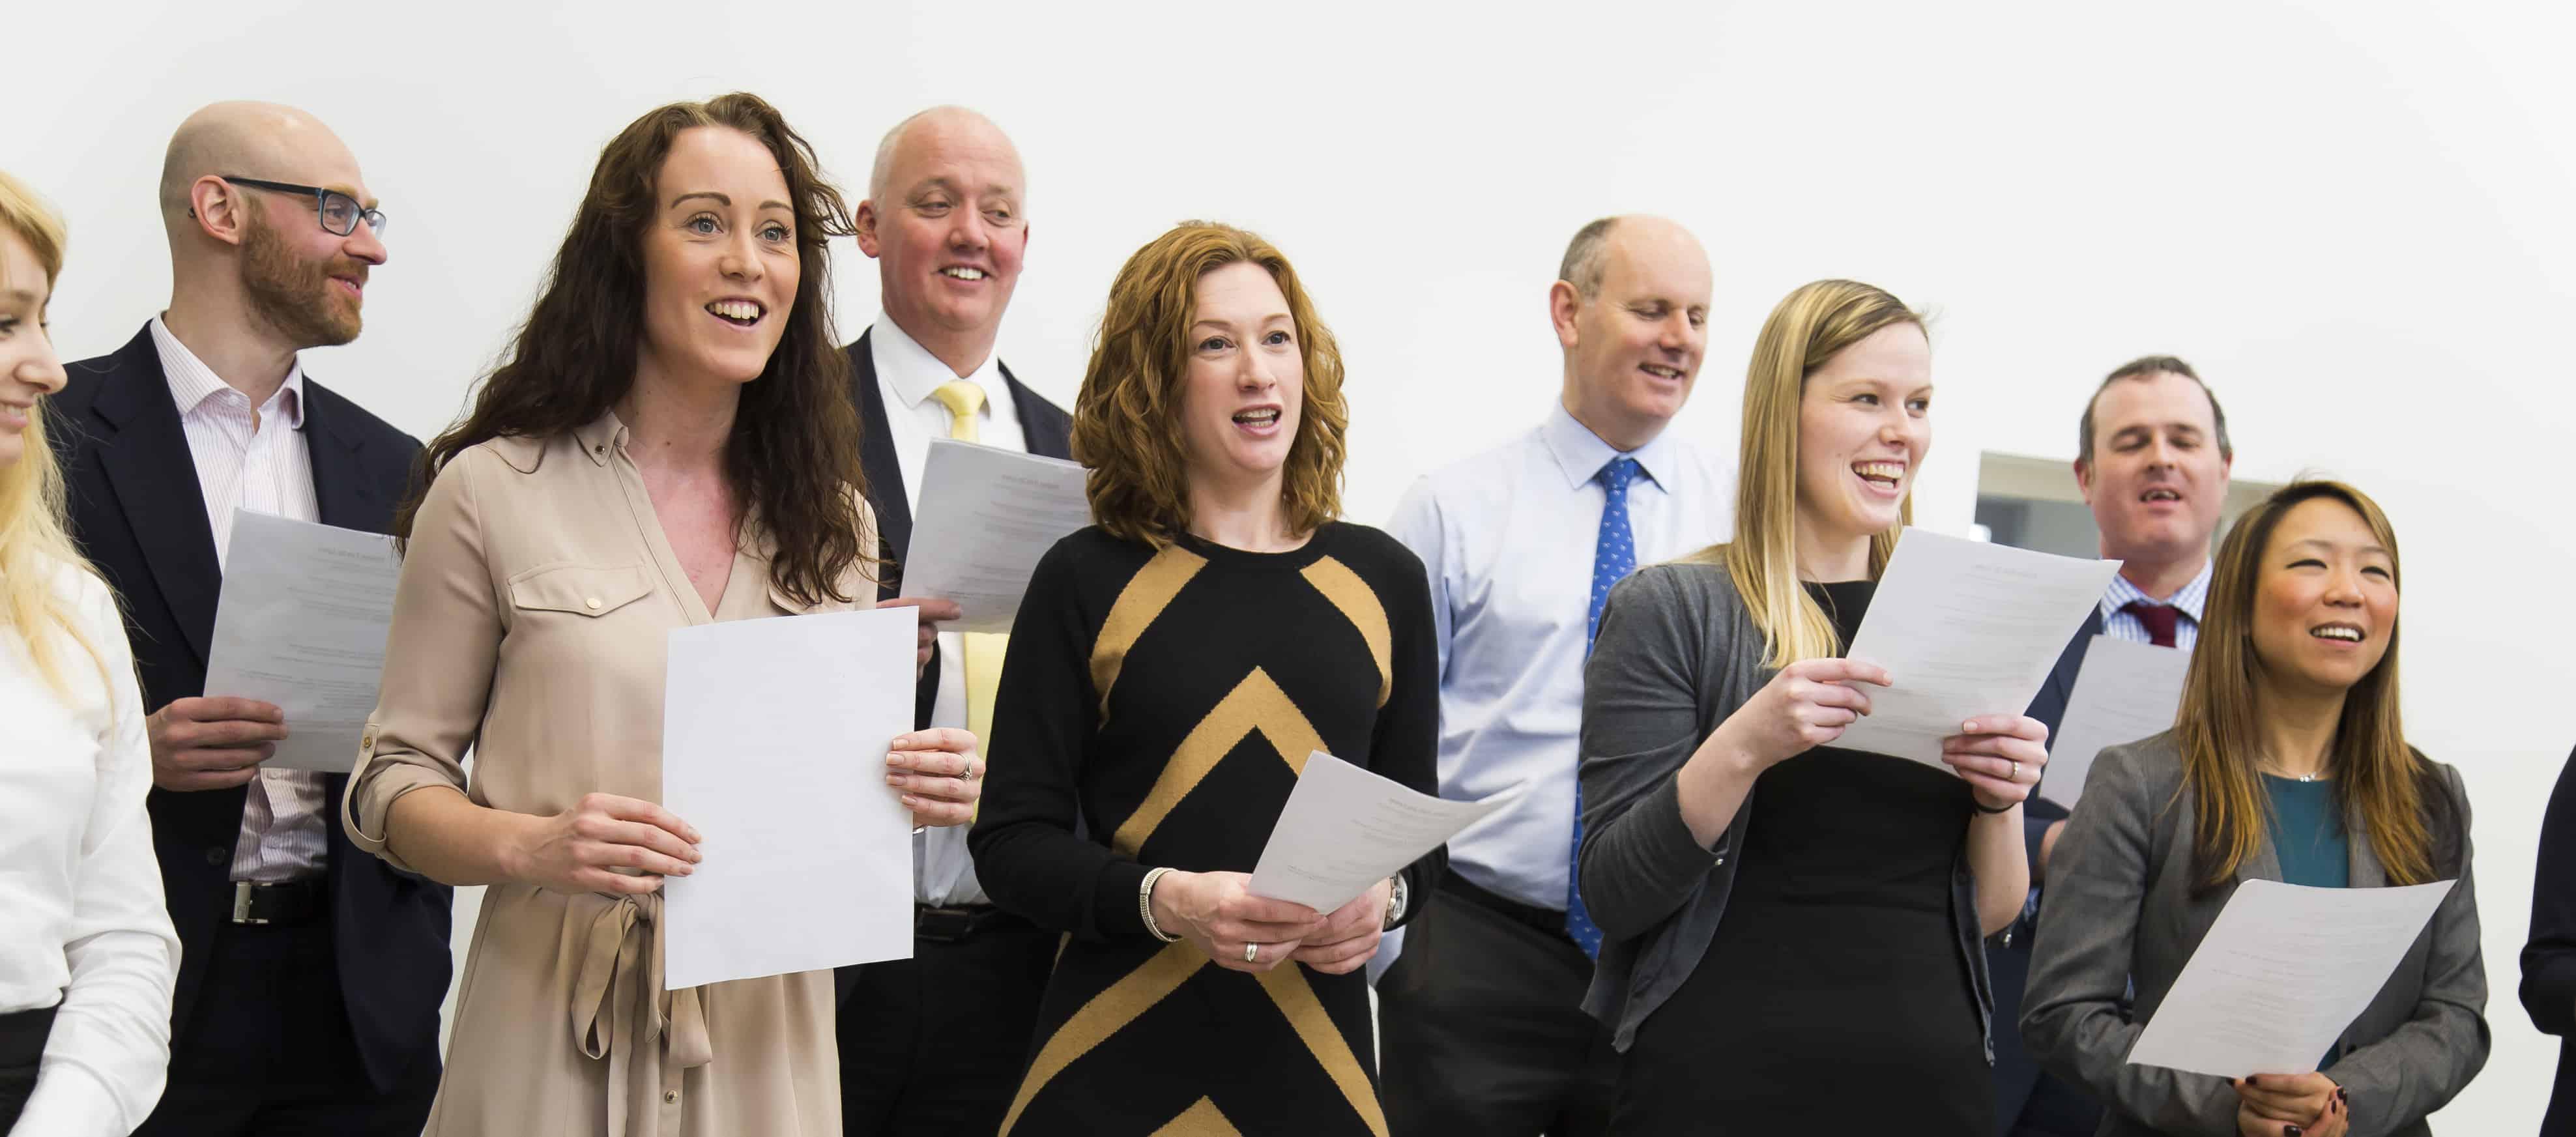 Wellington Place Workplace Choir singing